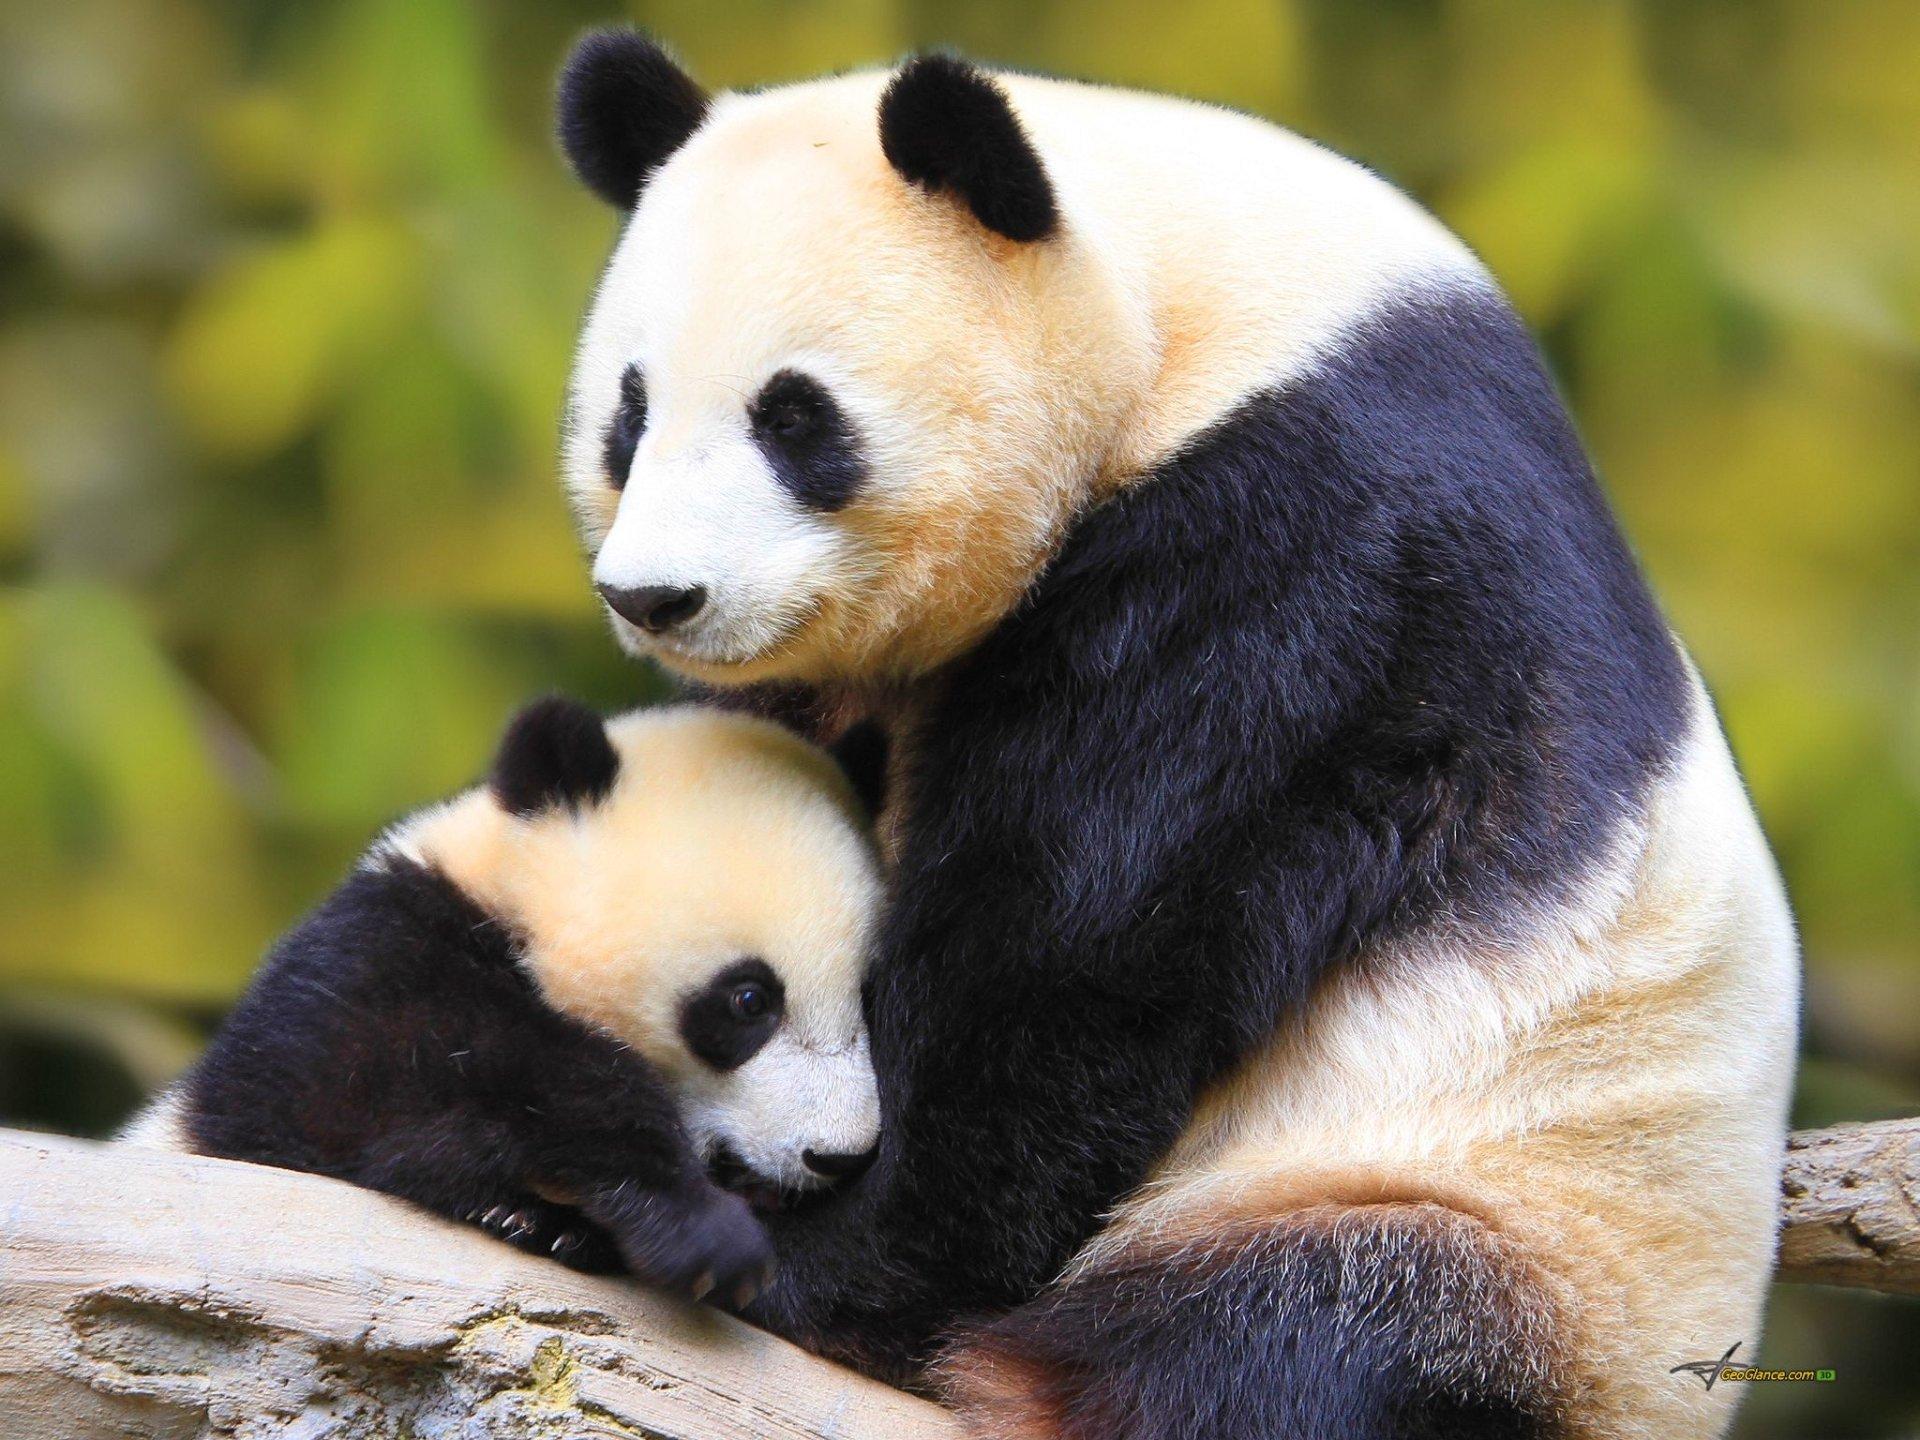 Panda Full HD Fond d'écran and Arrière-Plan | 2048x1536 | ID:363044